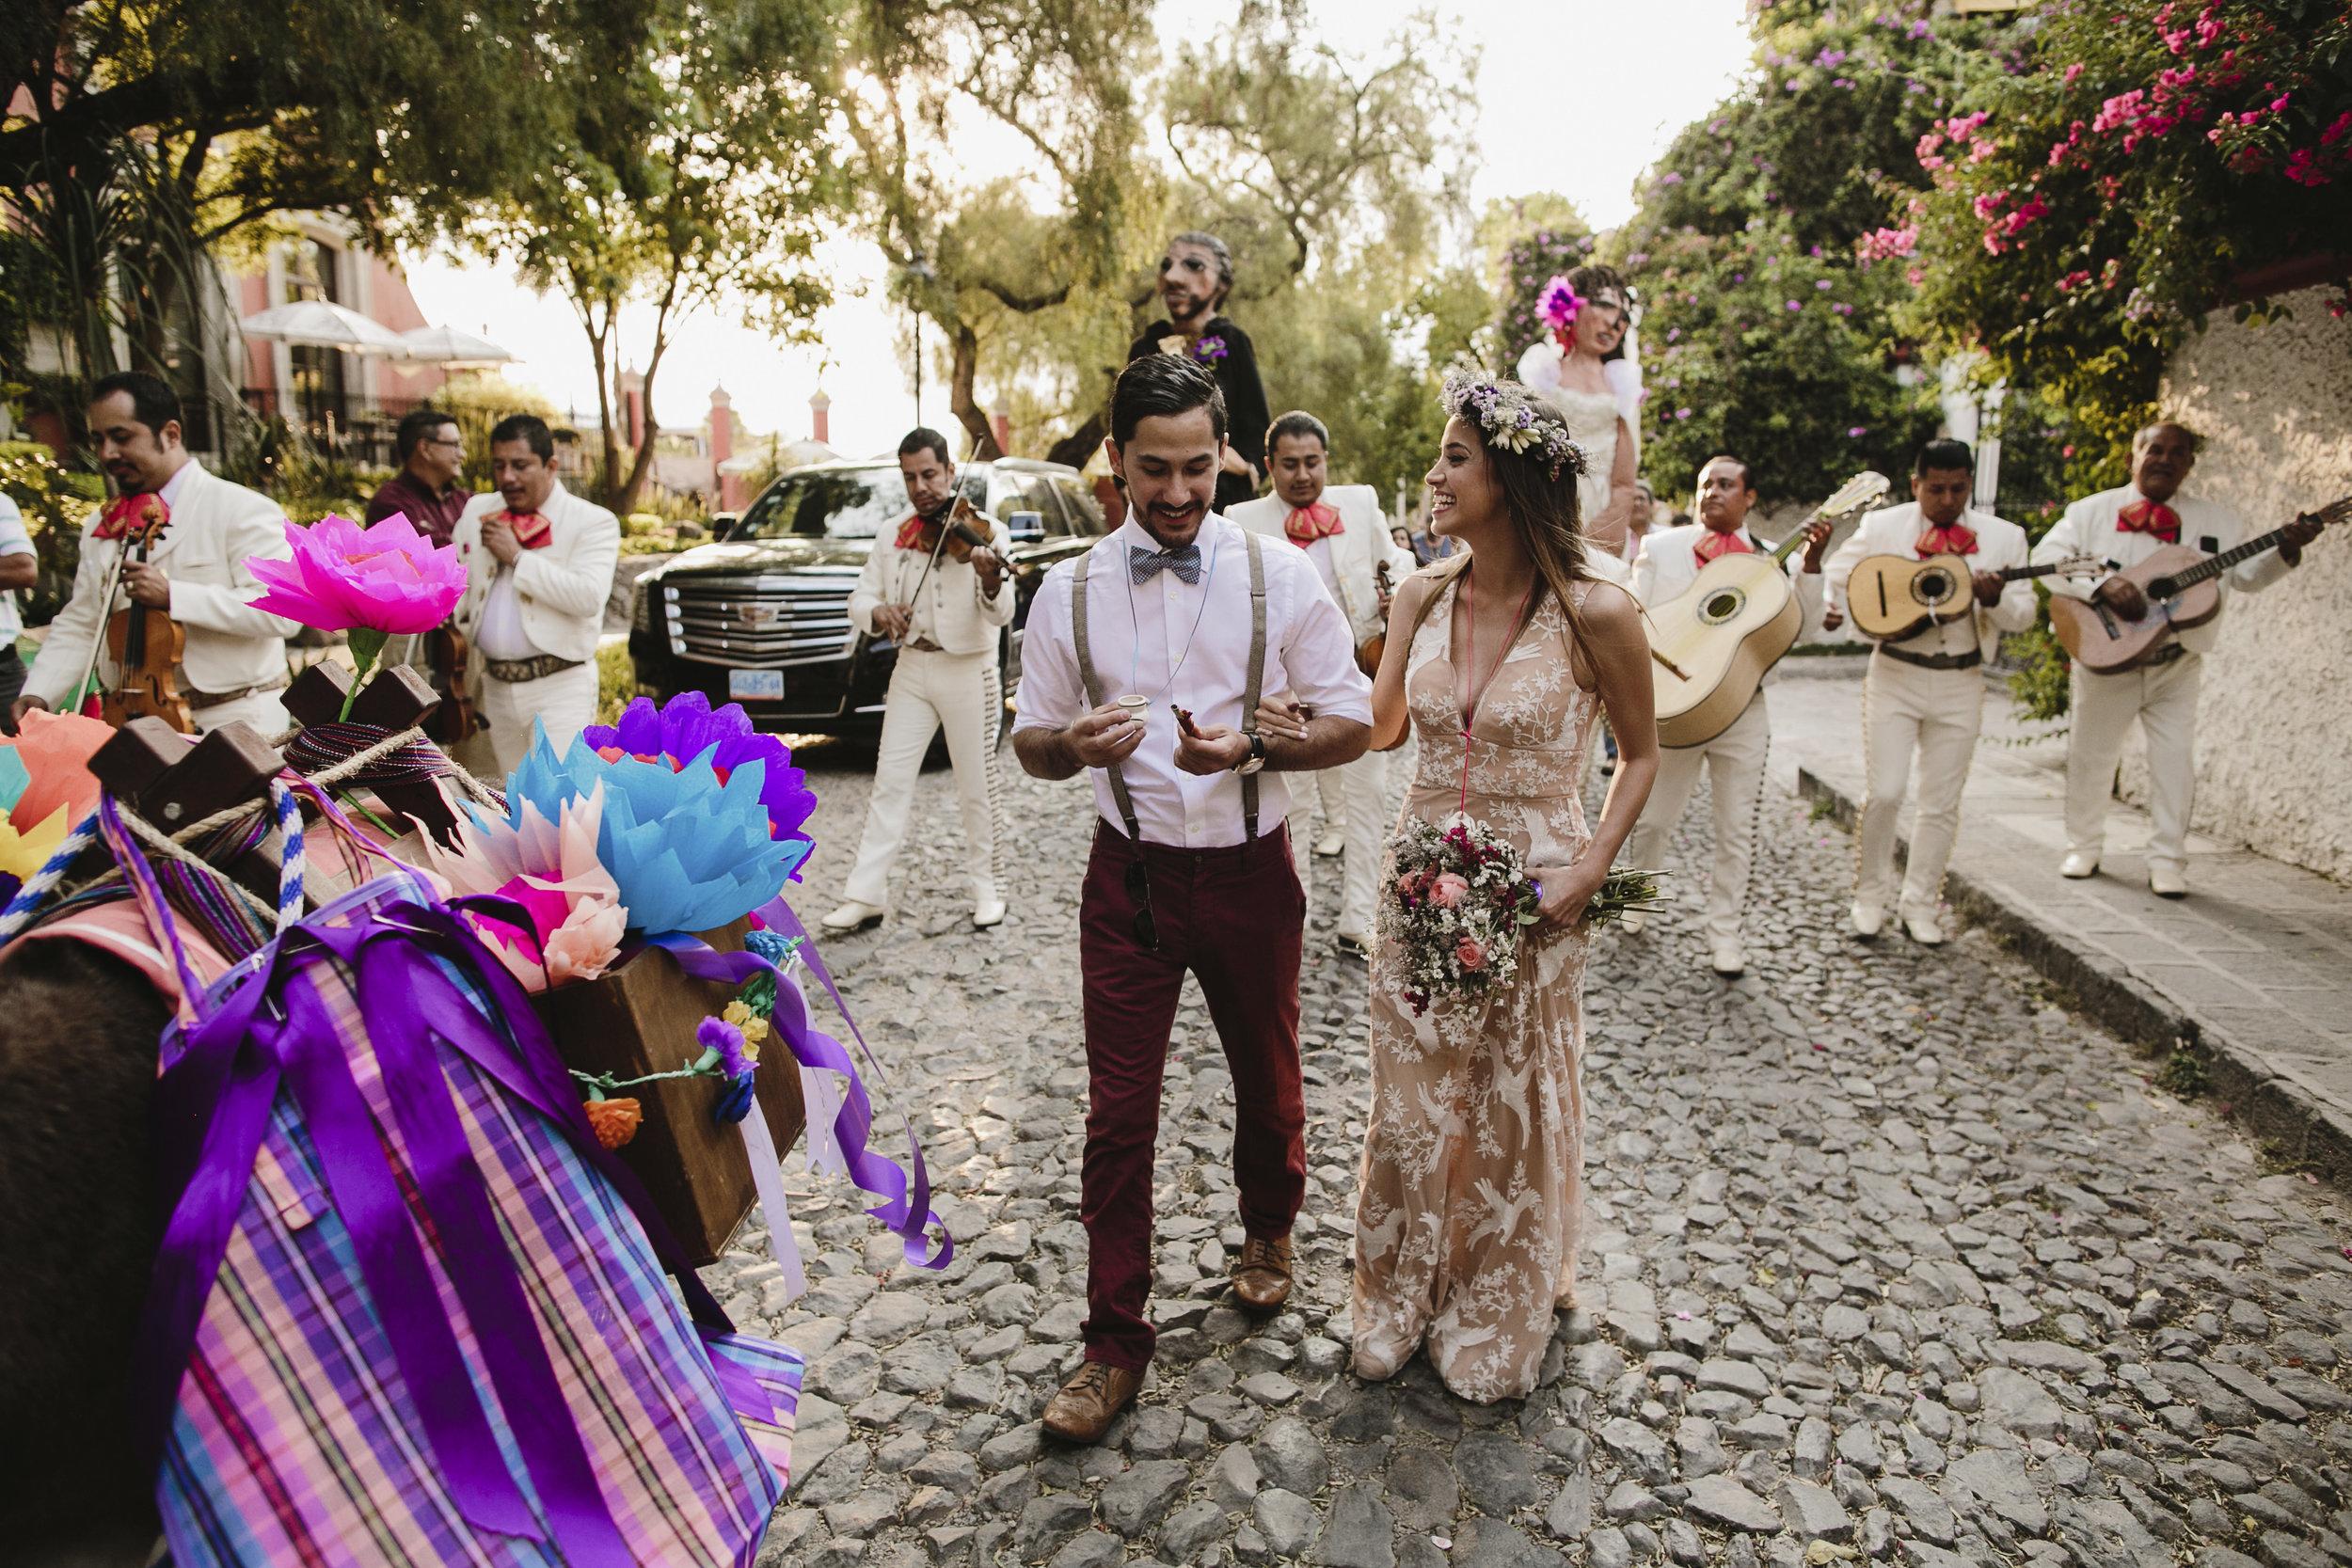 alfons_flores_destination_wedding_photography_mavi_david-292.JPG